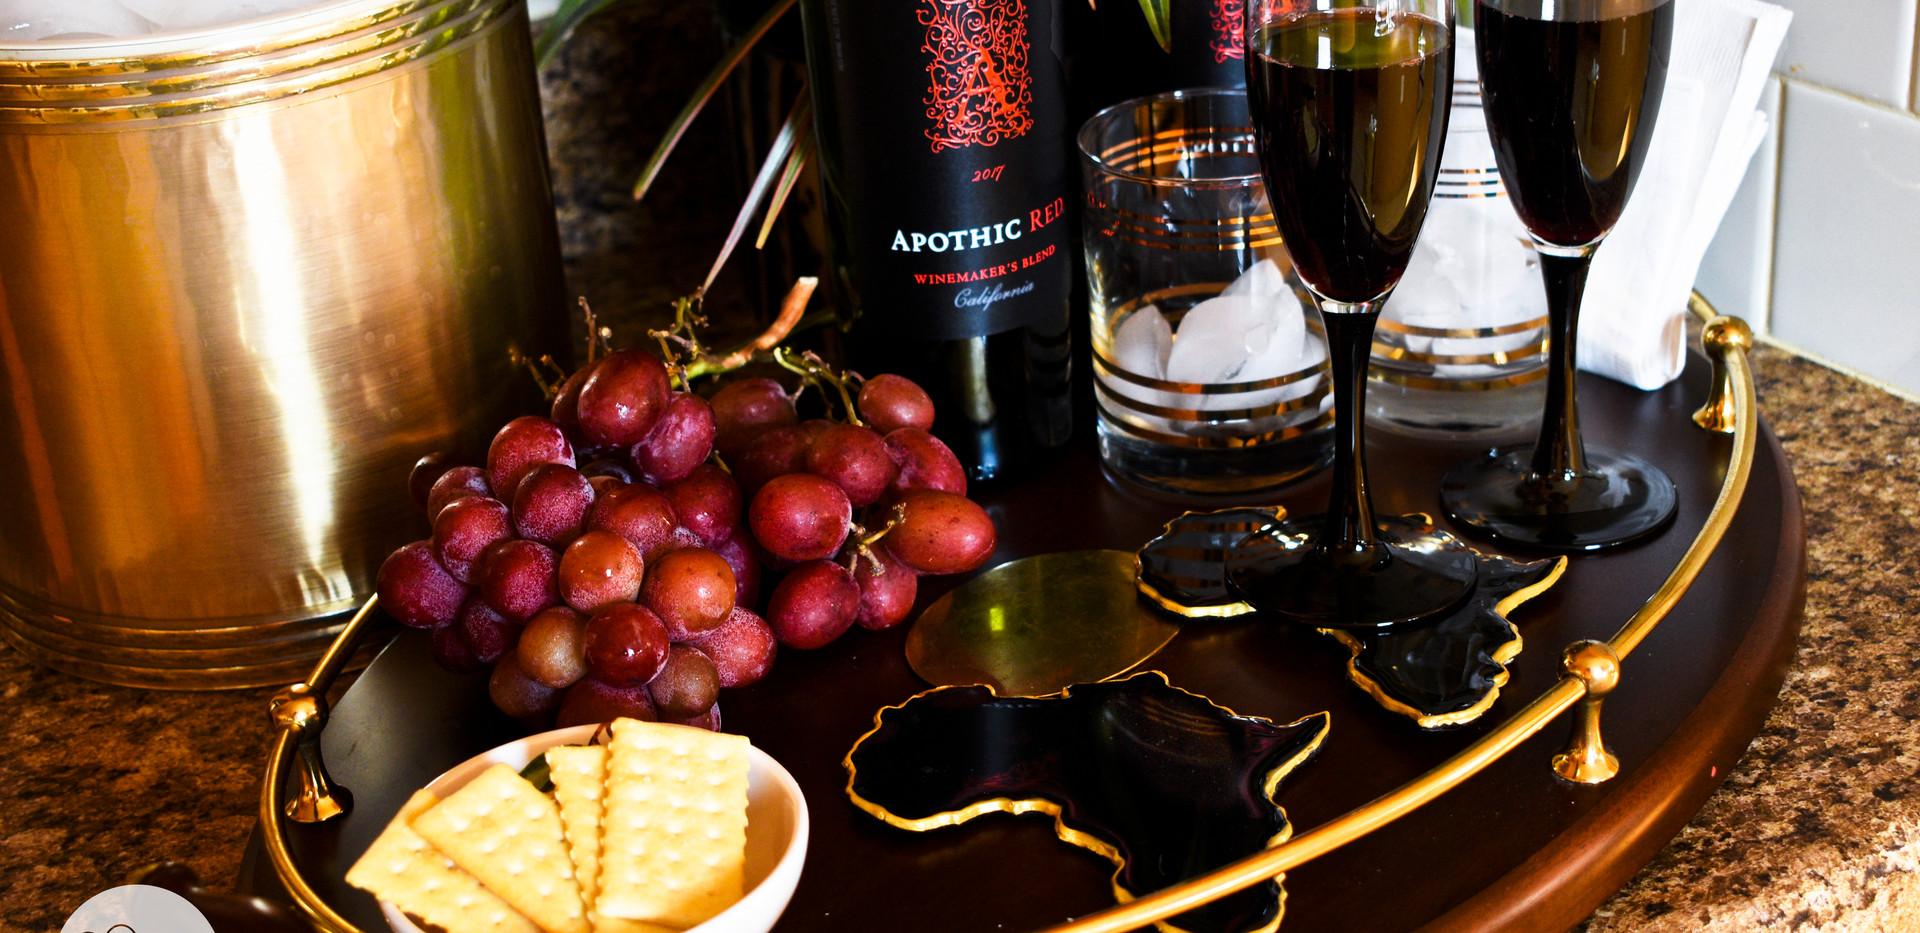 Rain Sky Home Black Coasters with Wine G